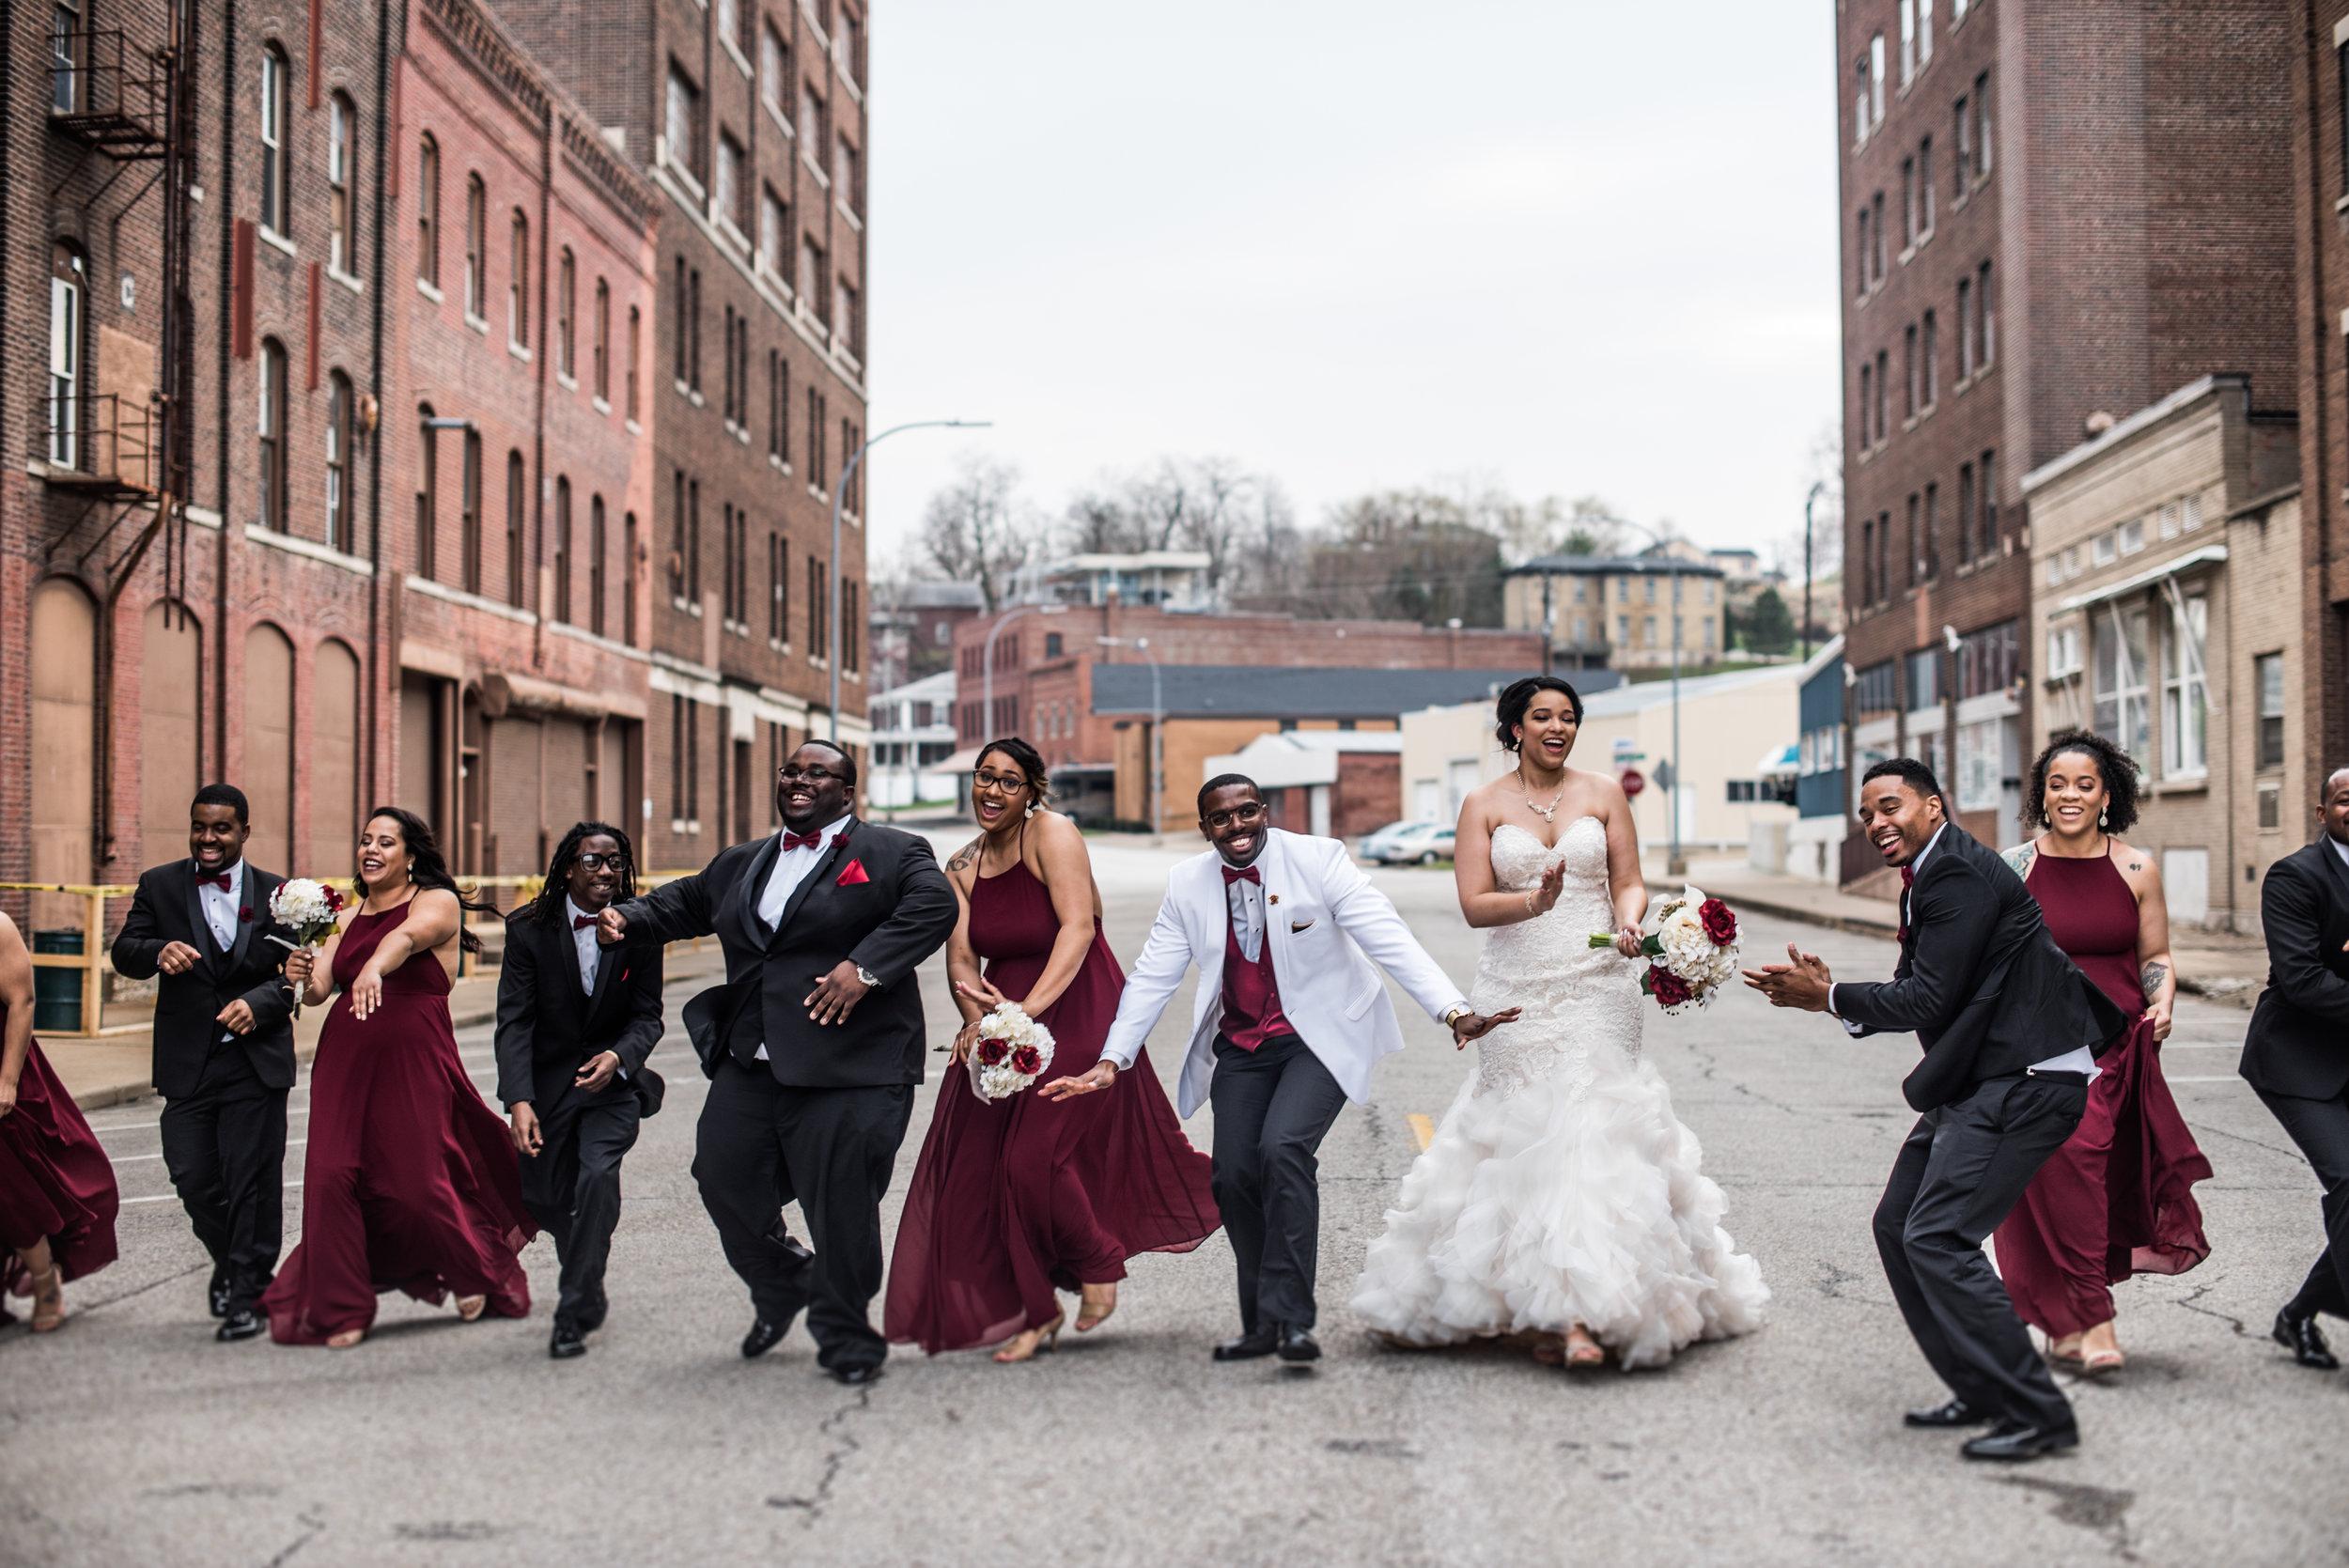 Burlington Iowa Wedding Midwest Photographer Melissa Cervantes _ Chantelle and Isaiah 555bb.jpg